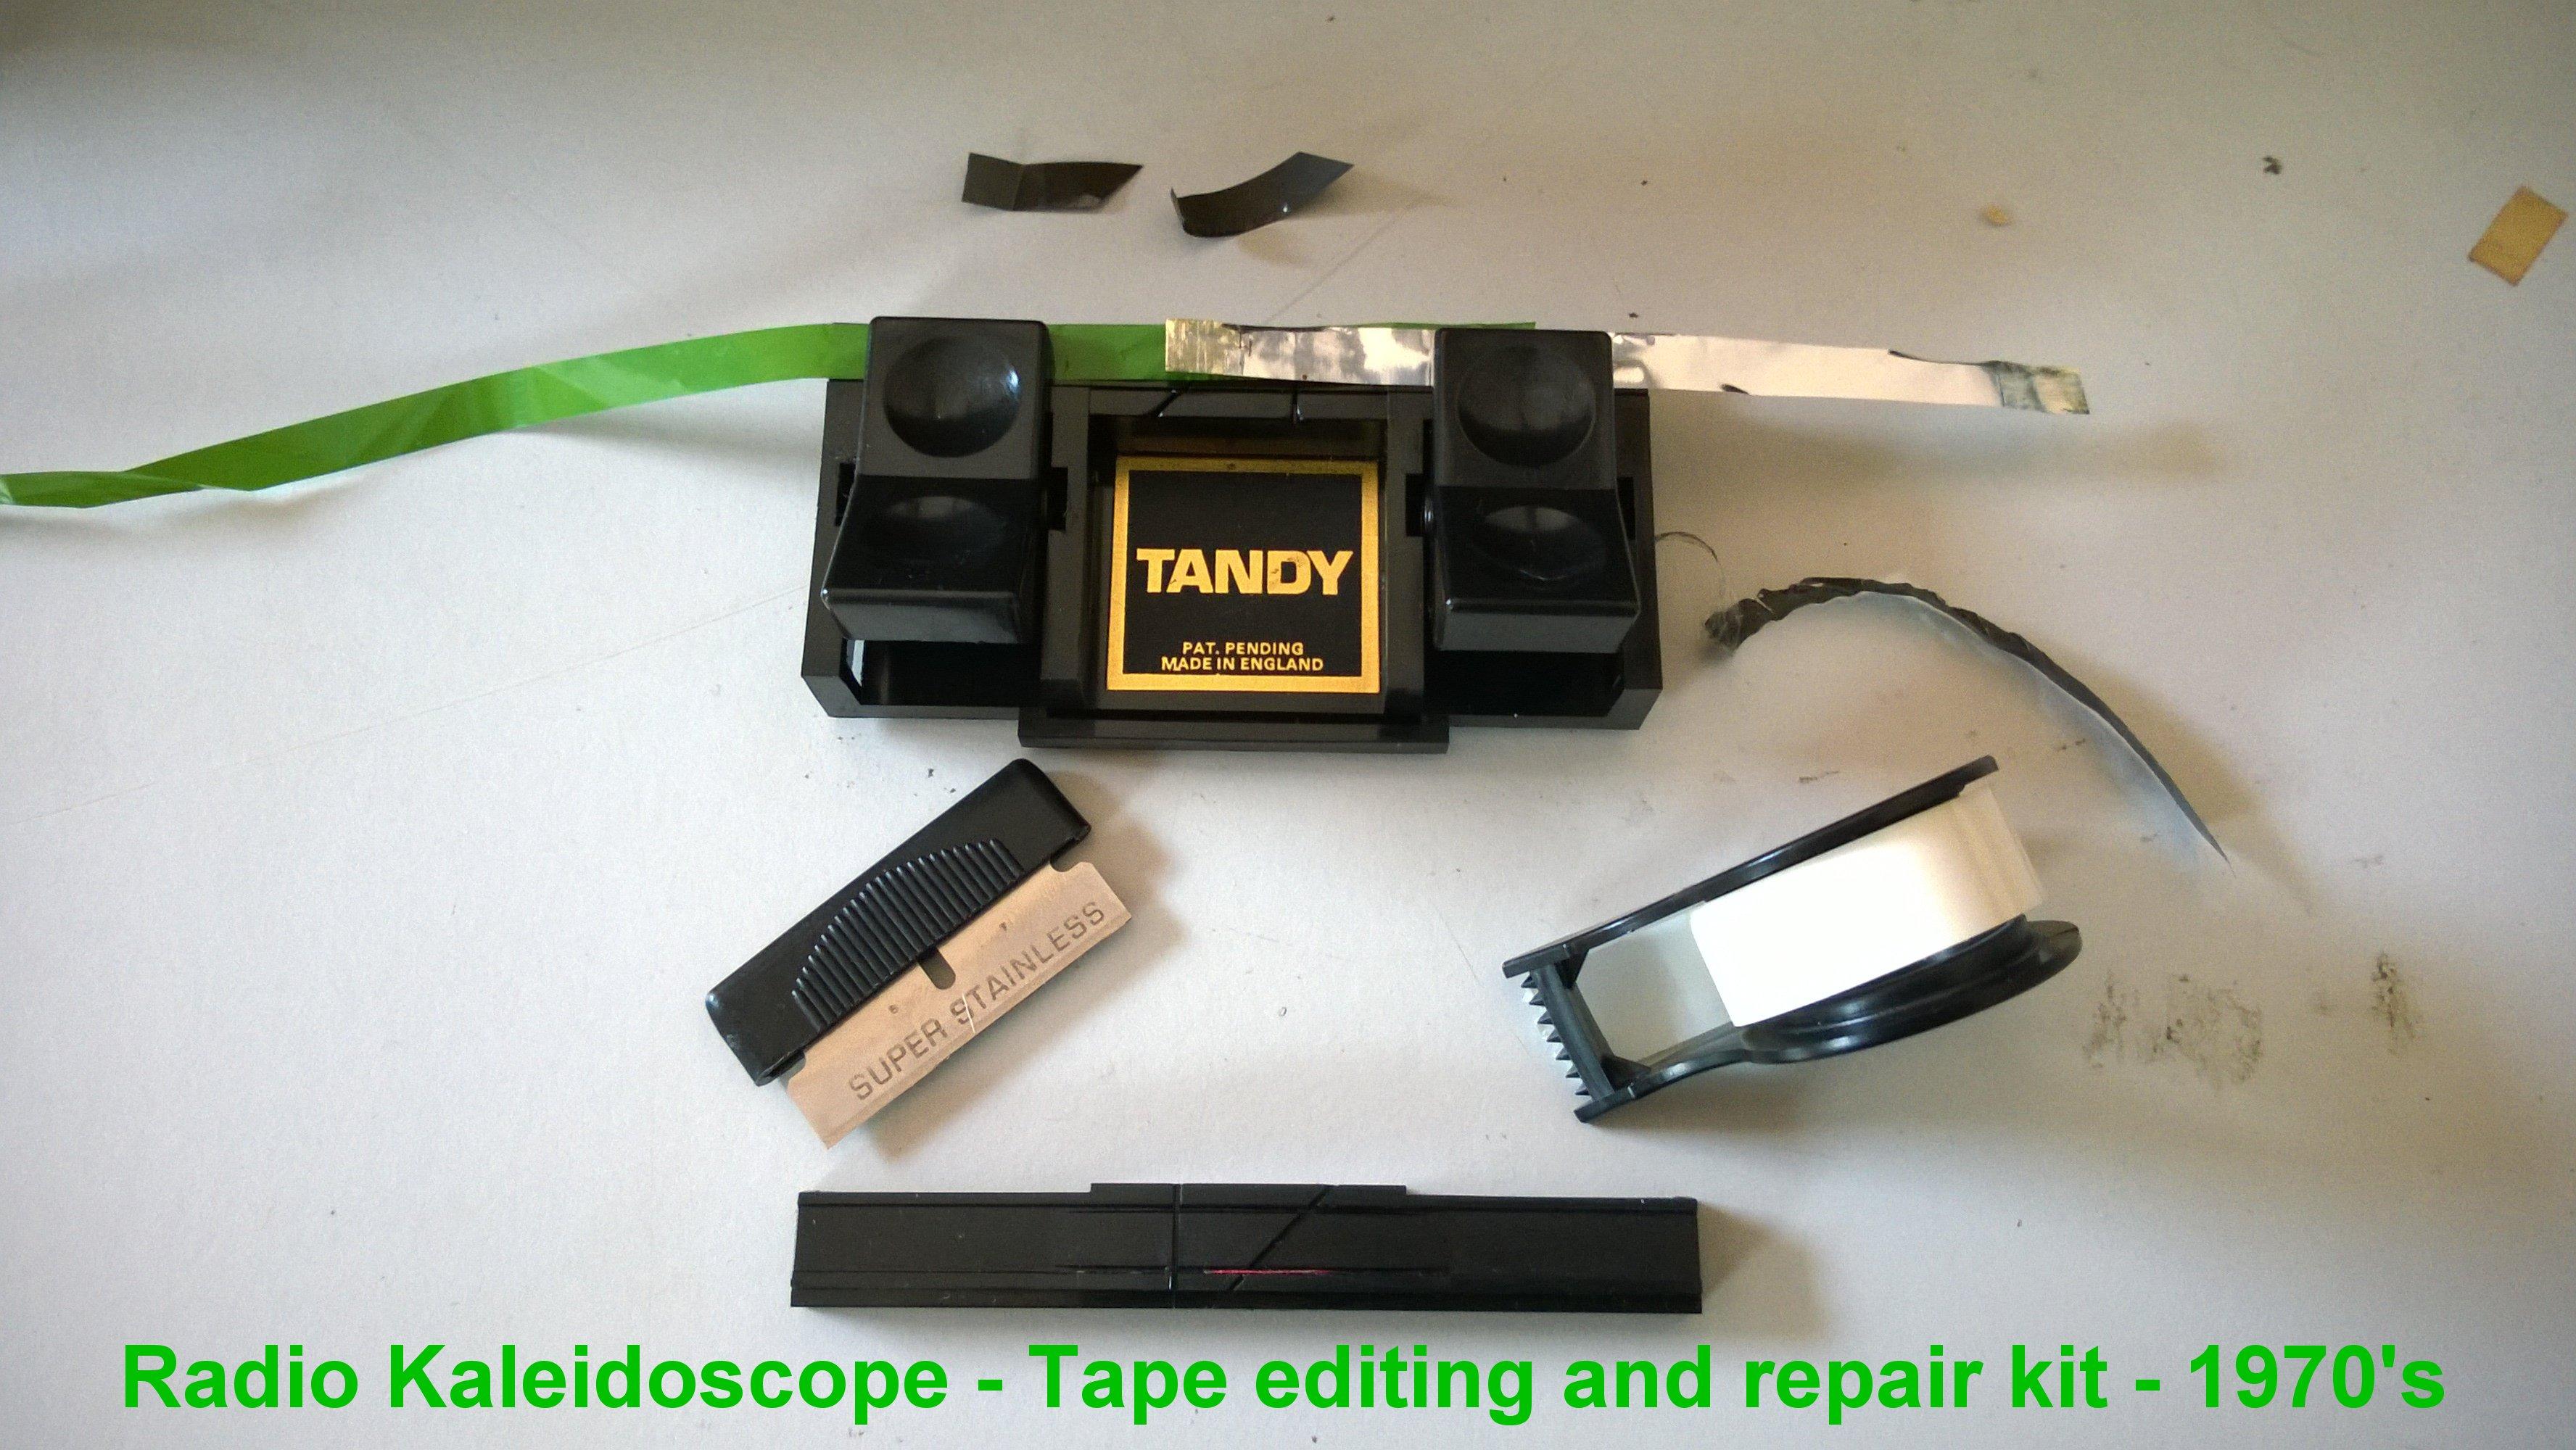 Radio Kaleidoscope Tape editing kit -1970